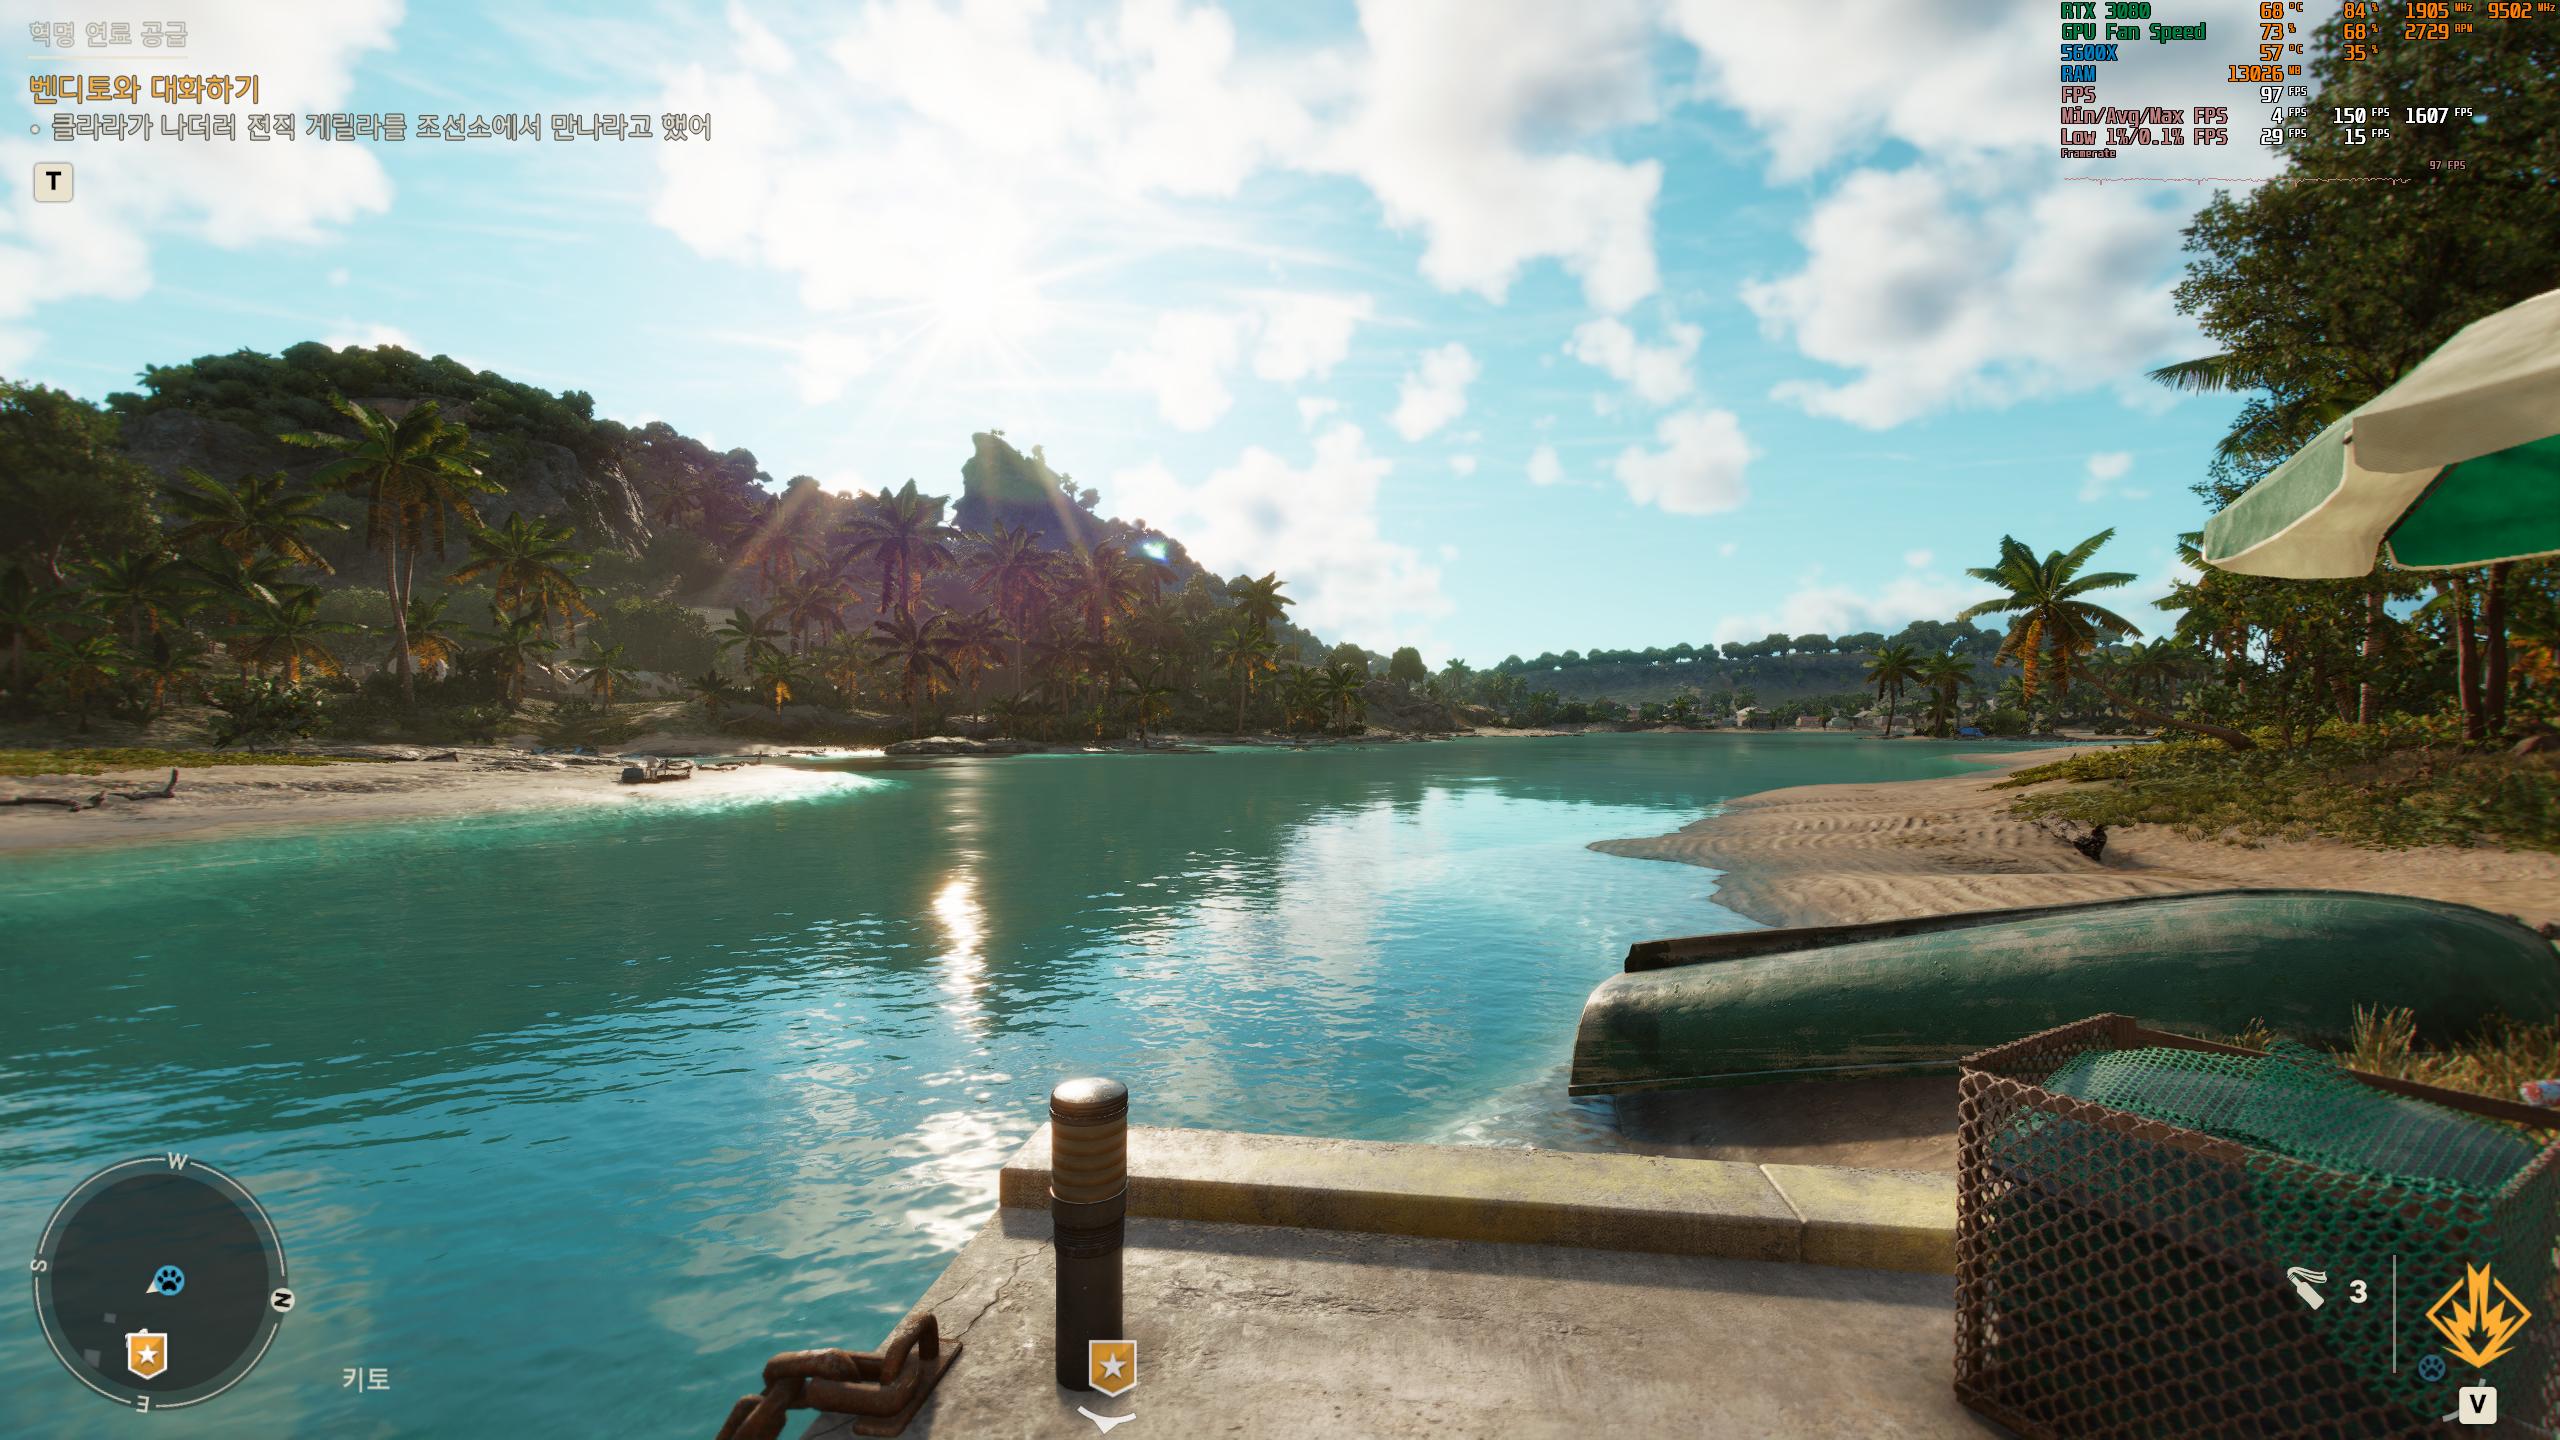 Far Cry 6 Screenshot 2021.10.11 - 03.08.42.03.png